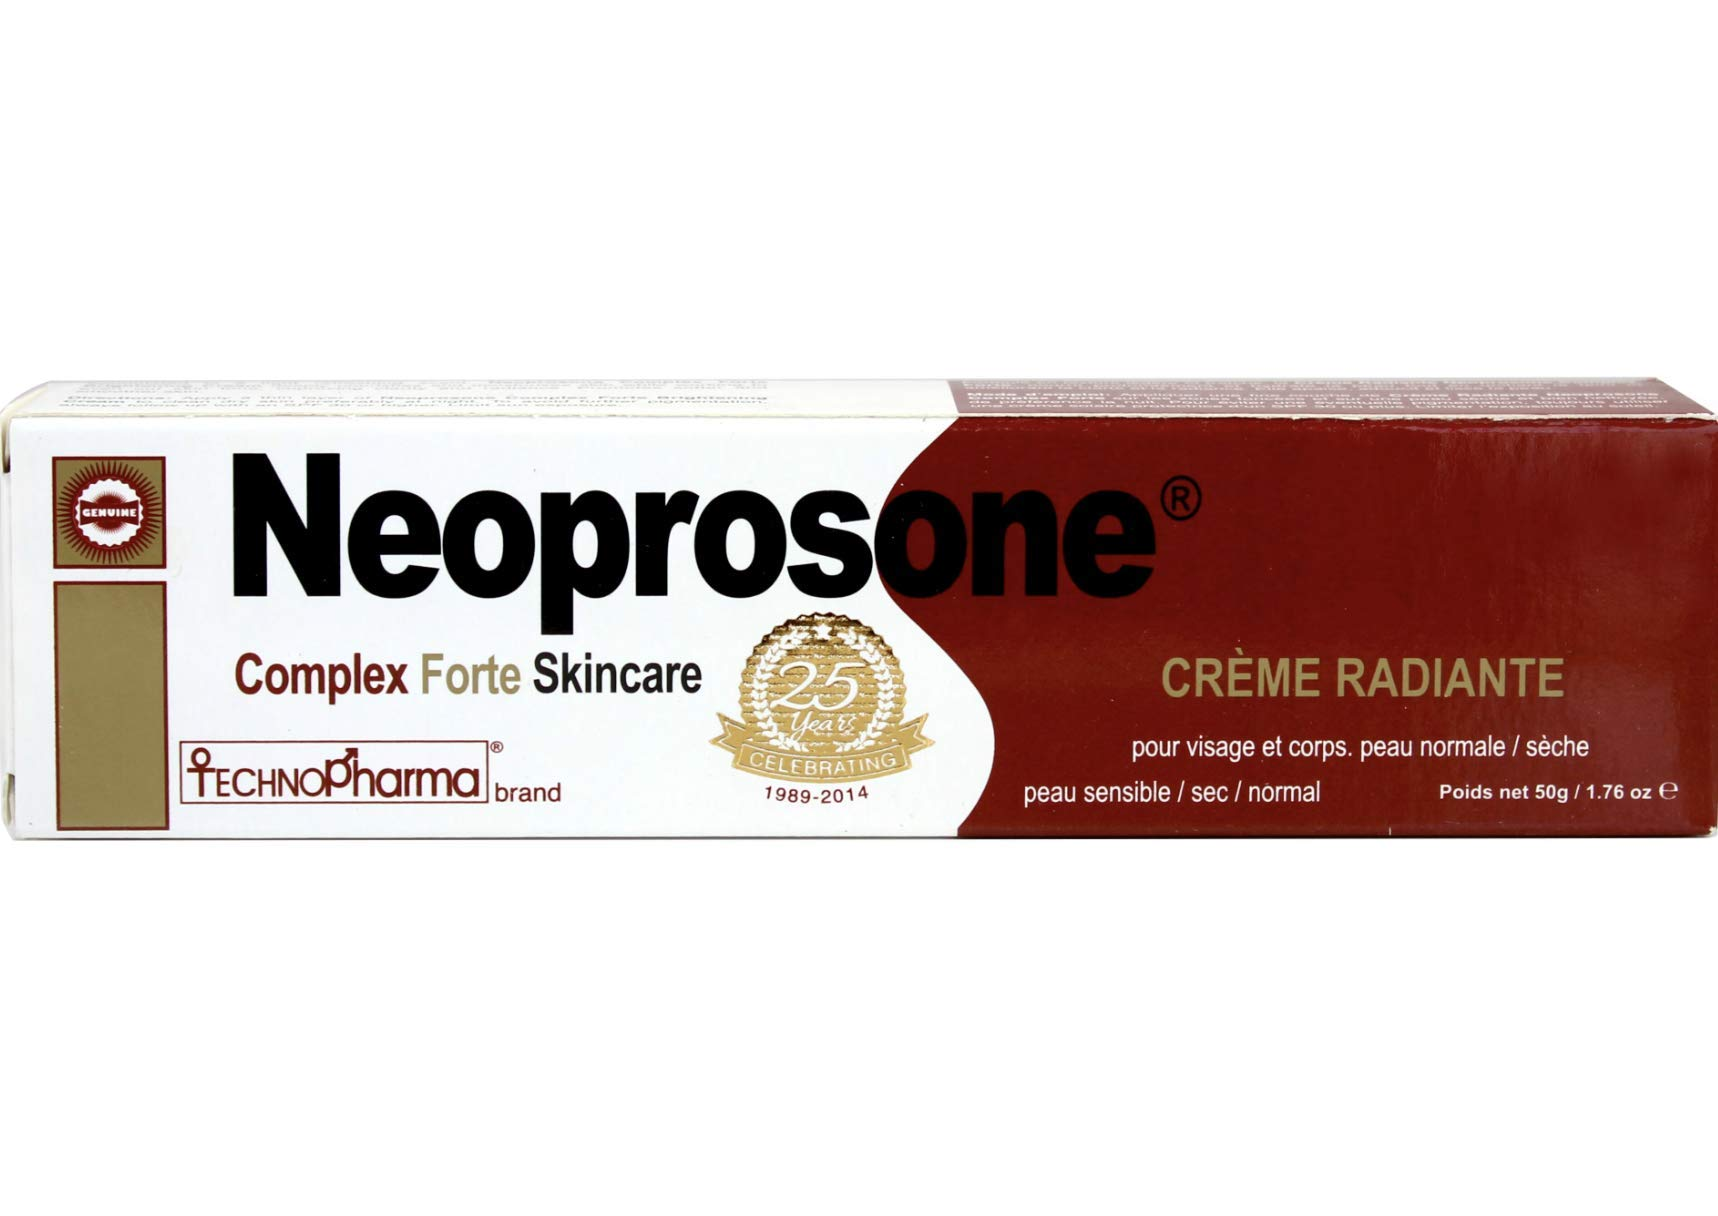 Neoprosone Cream 50g - Formulated to Fade Dark Spots, with Alpha Arbutin Complex